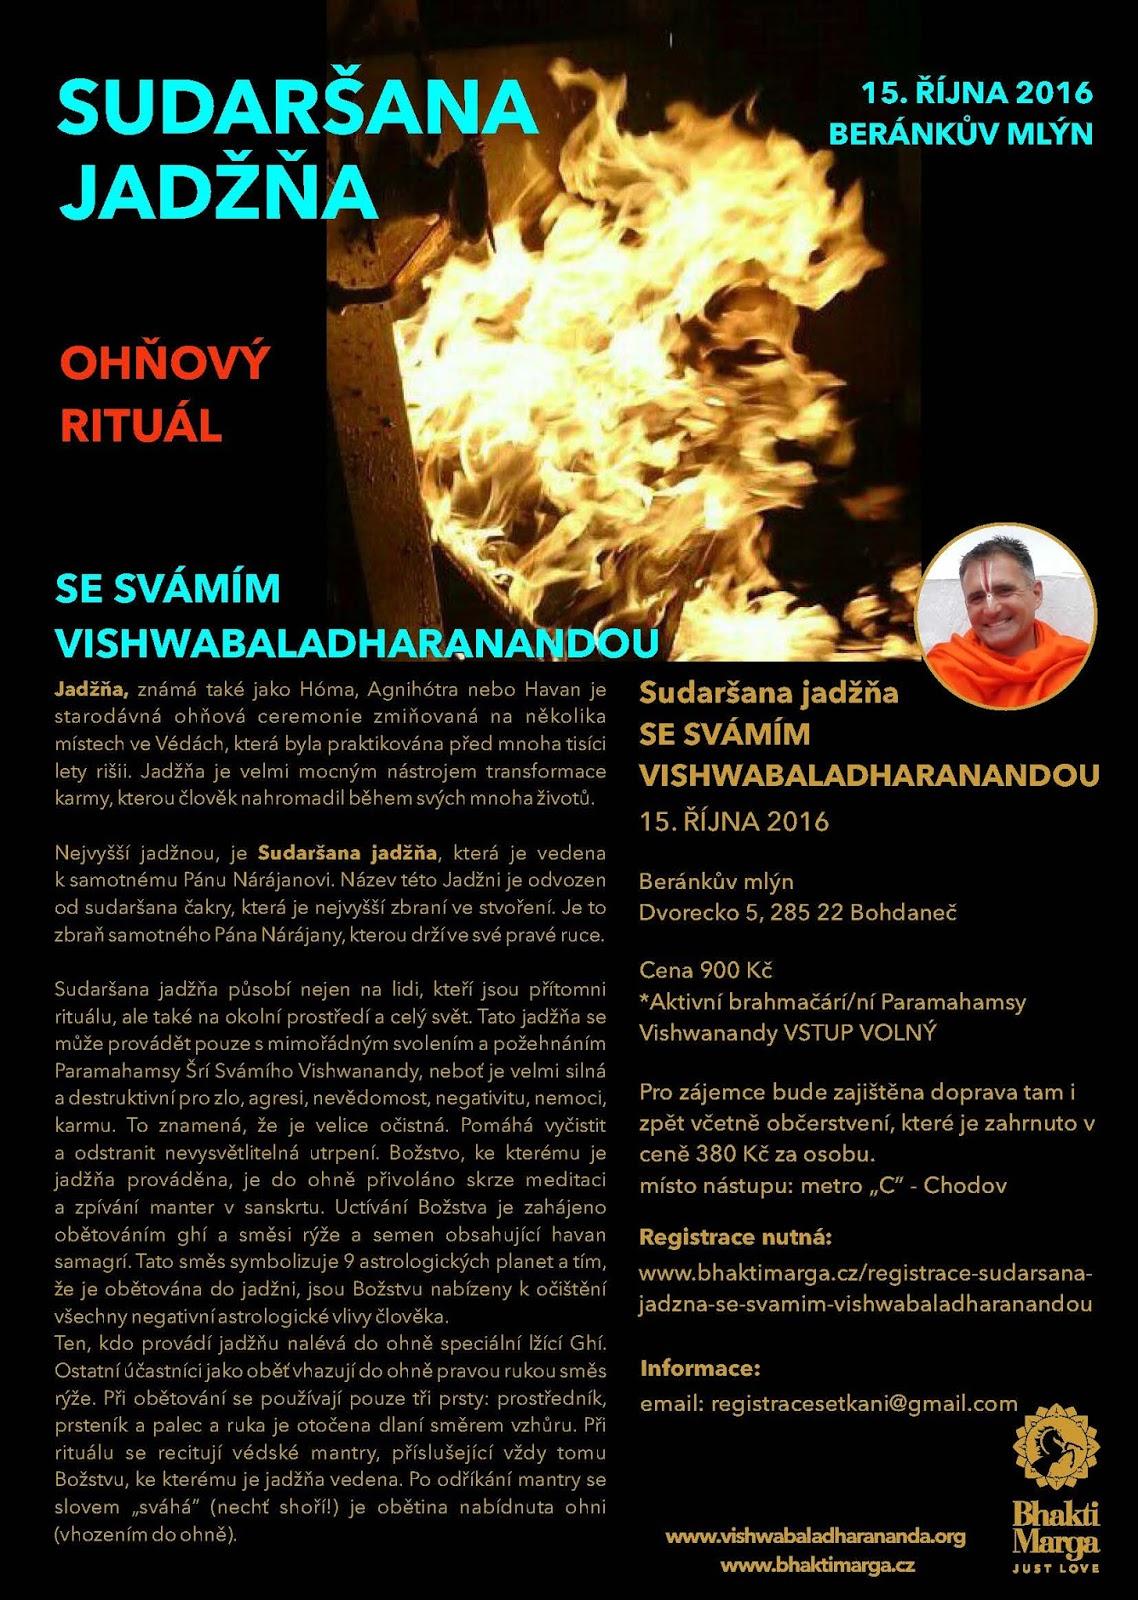 Sudaršana jadžňa se Svámím Vishwabaladharanandou